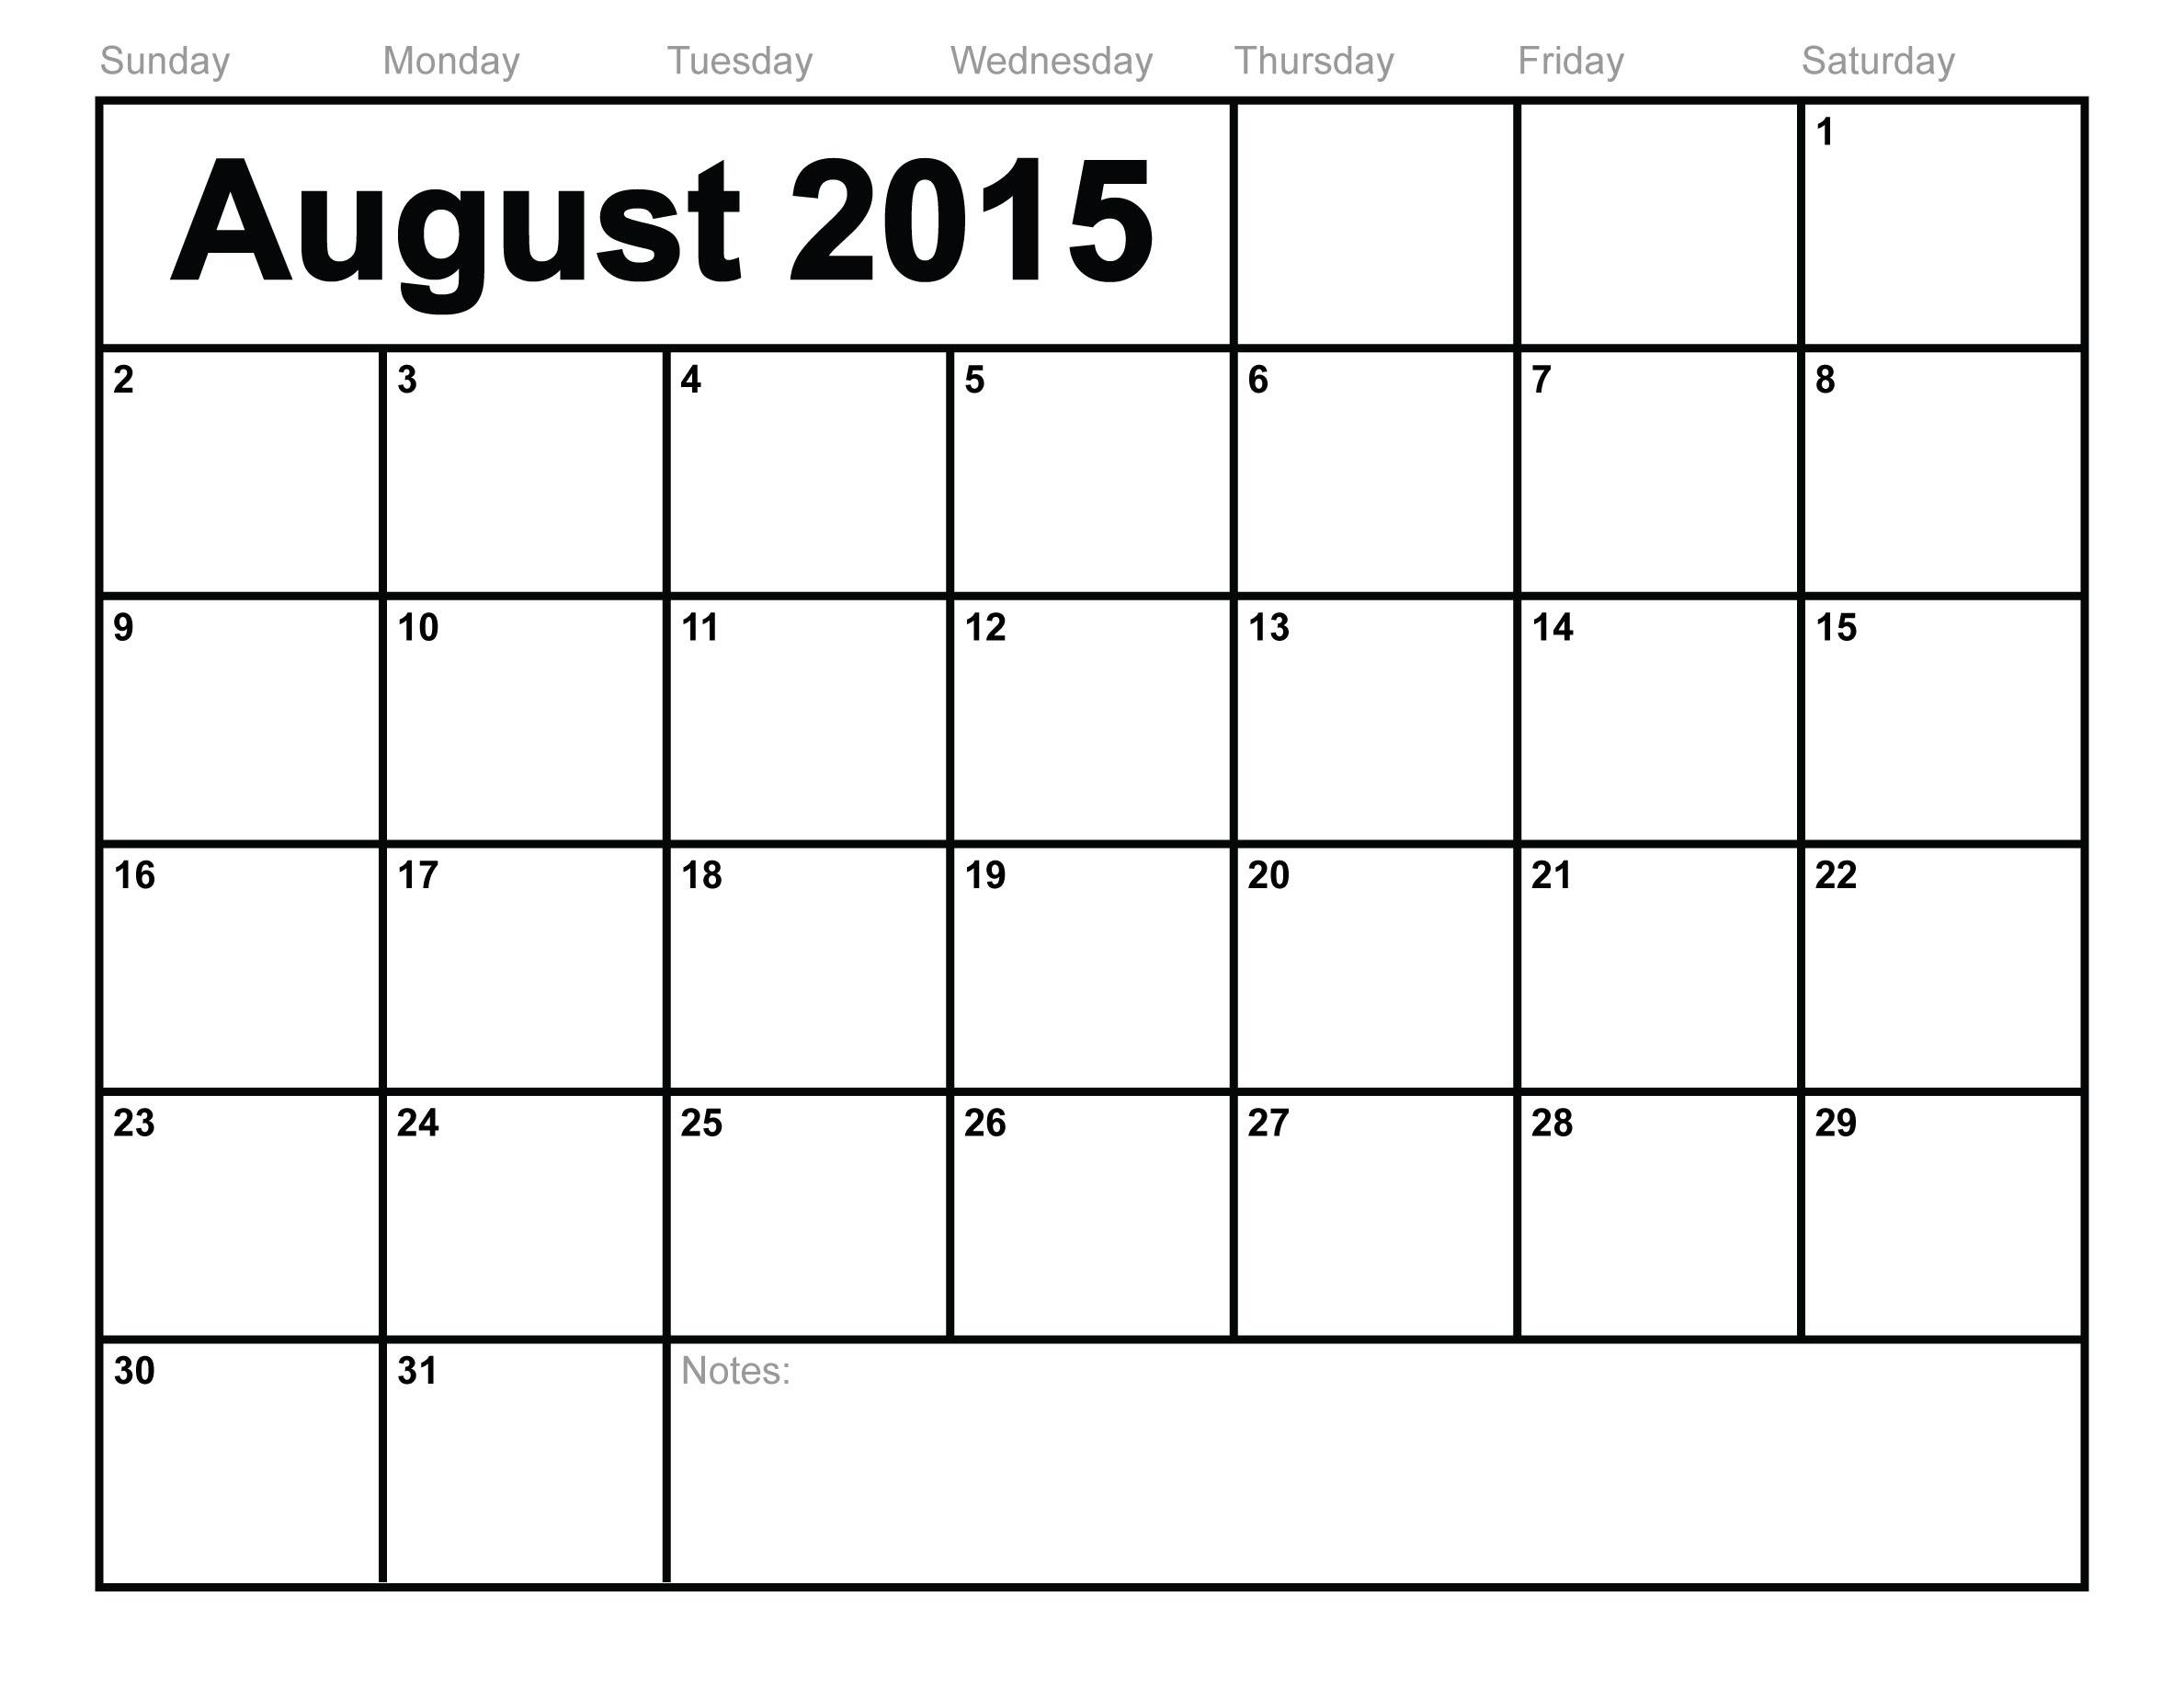 August 2018 Calendar Printable - Printable Calendar & Birthday Cards Free Printable 1 Month Calendar